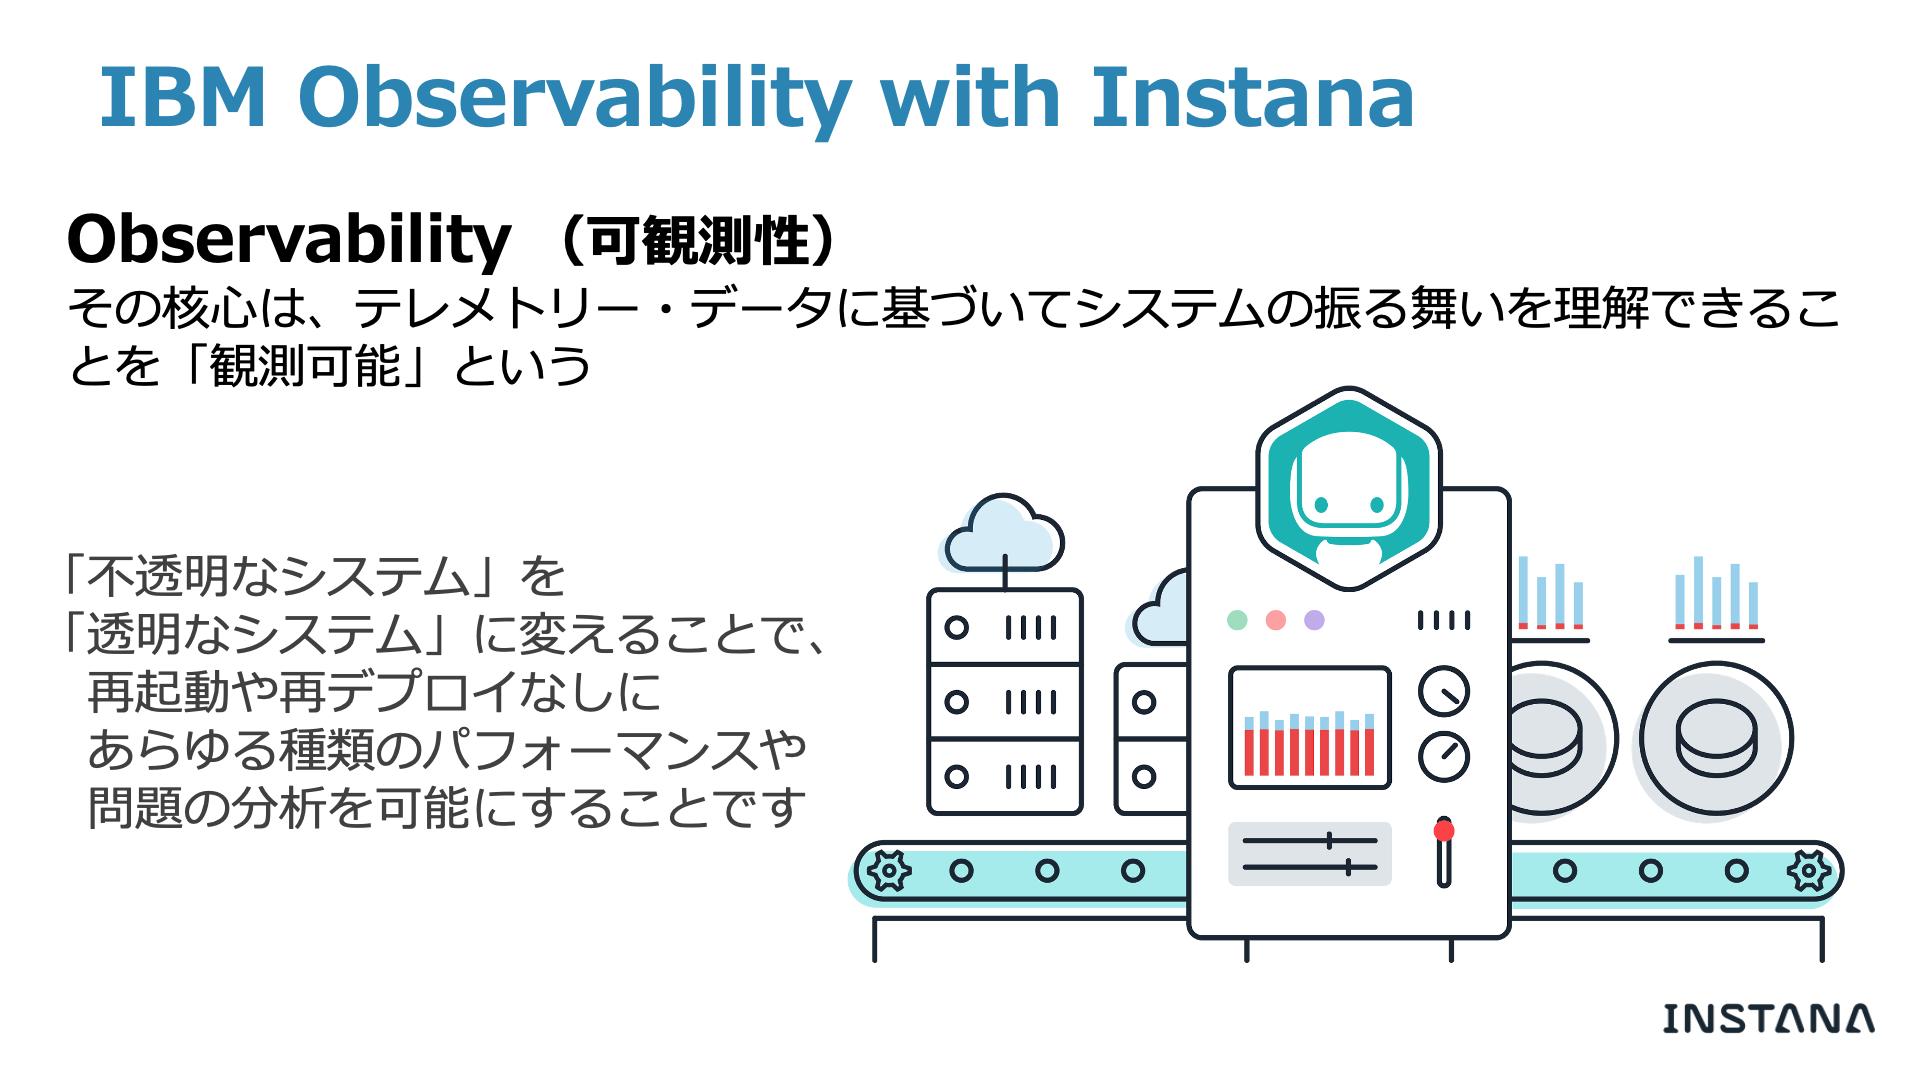 IBM Observability with Instana